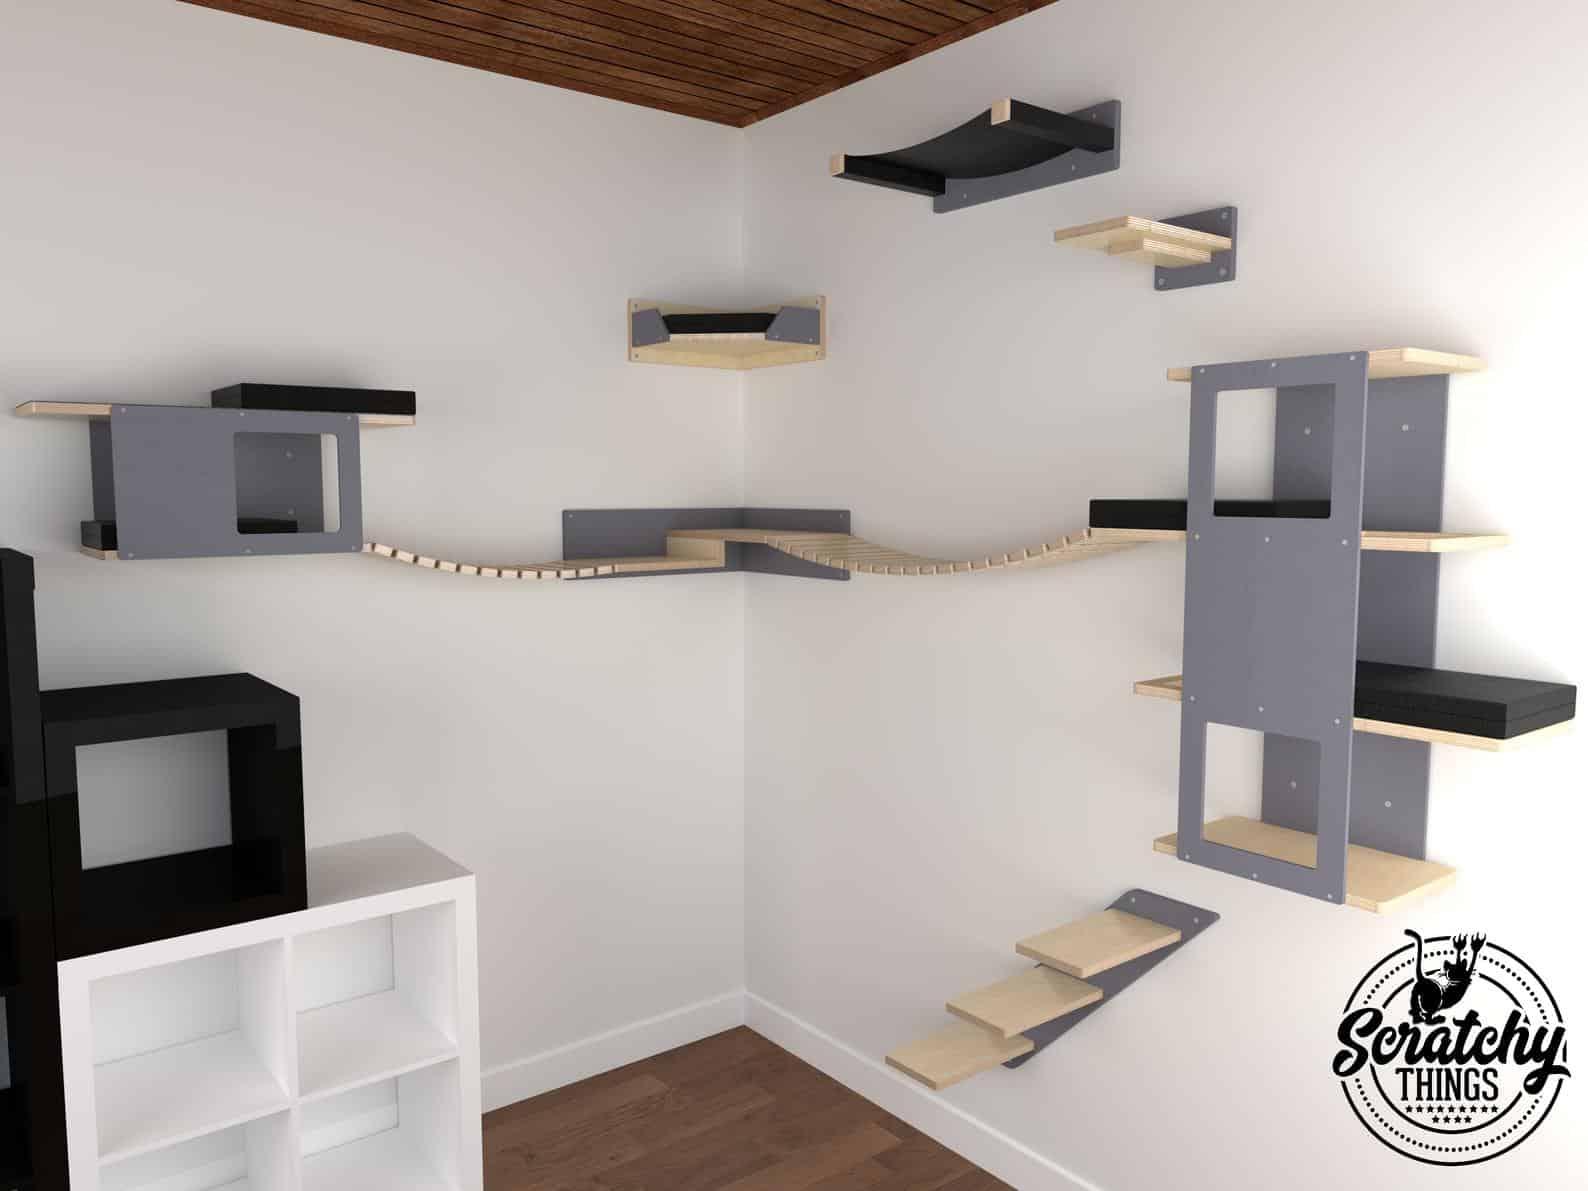 plateforme-arbre-a-chat-design-suspendu